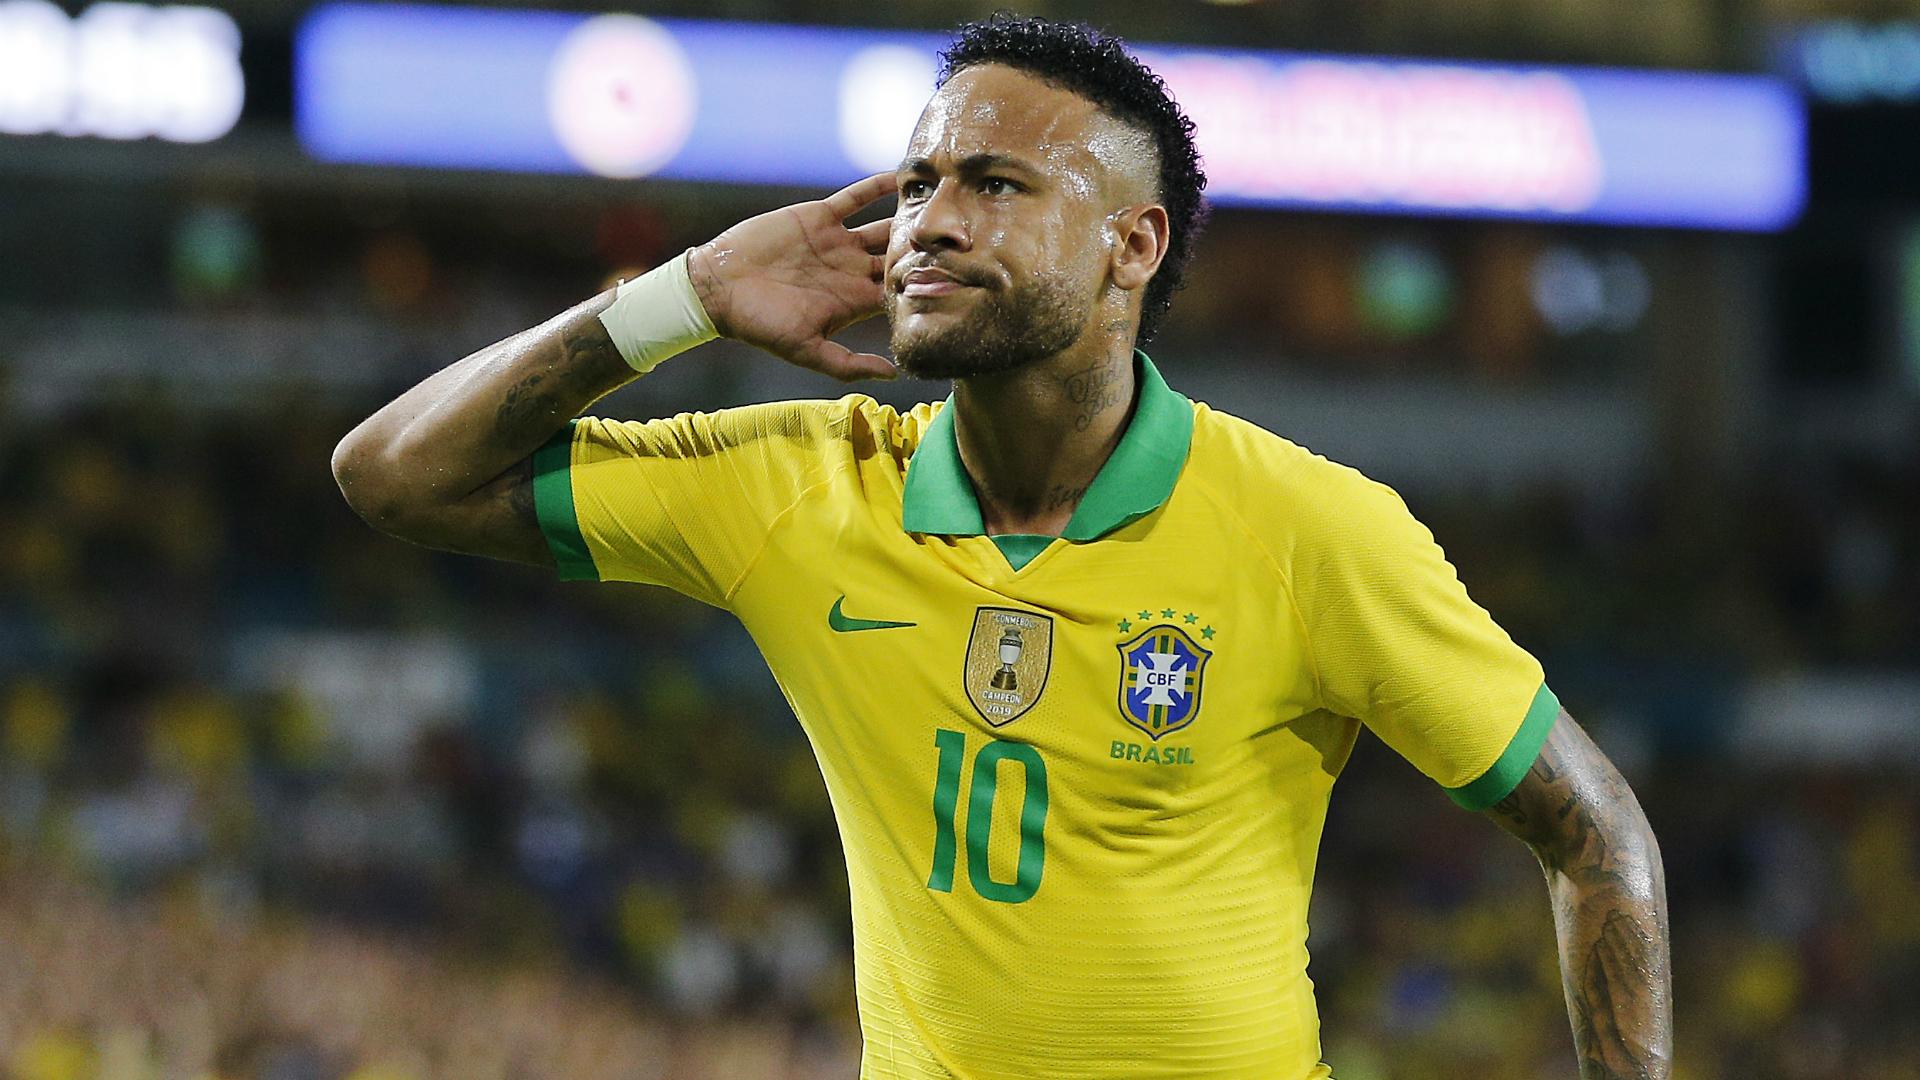 Neymar is happy in Brazil squad – Tite